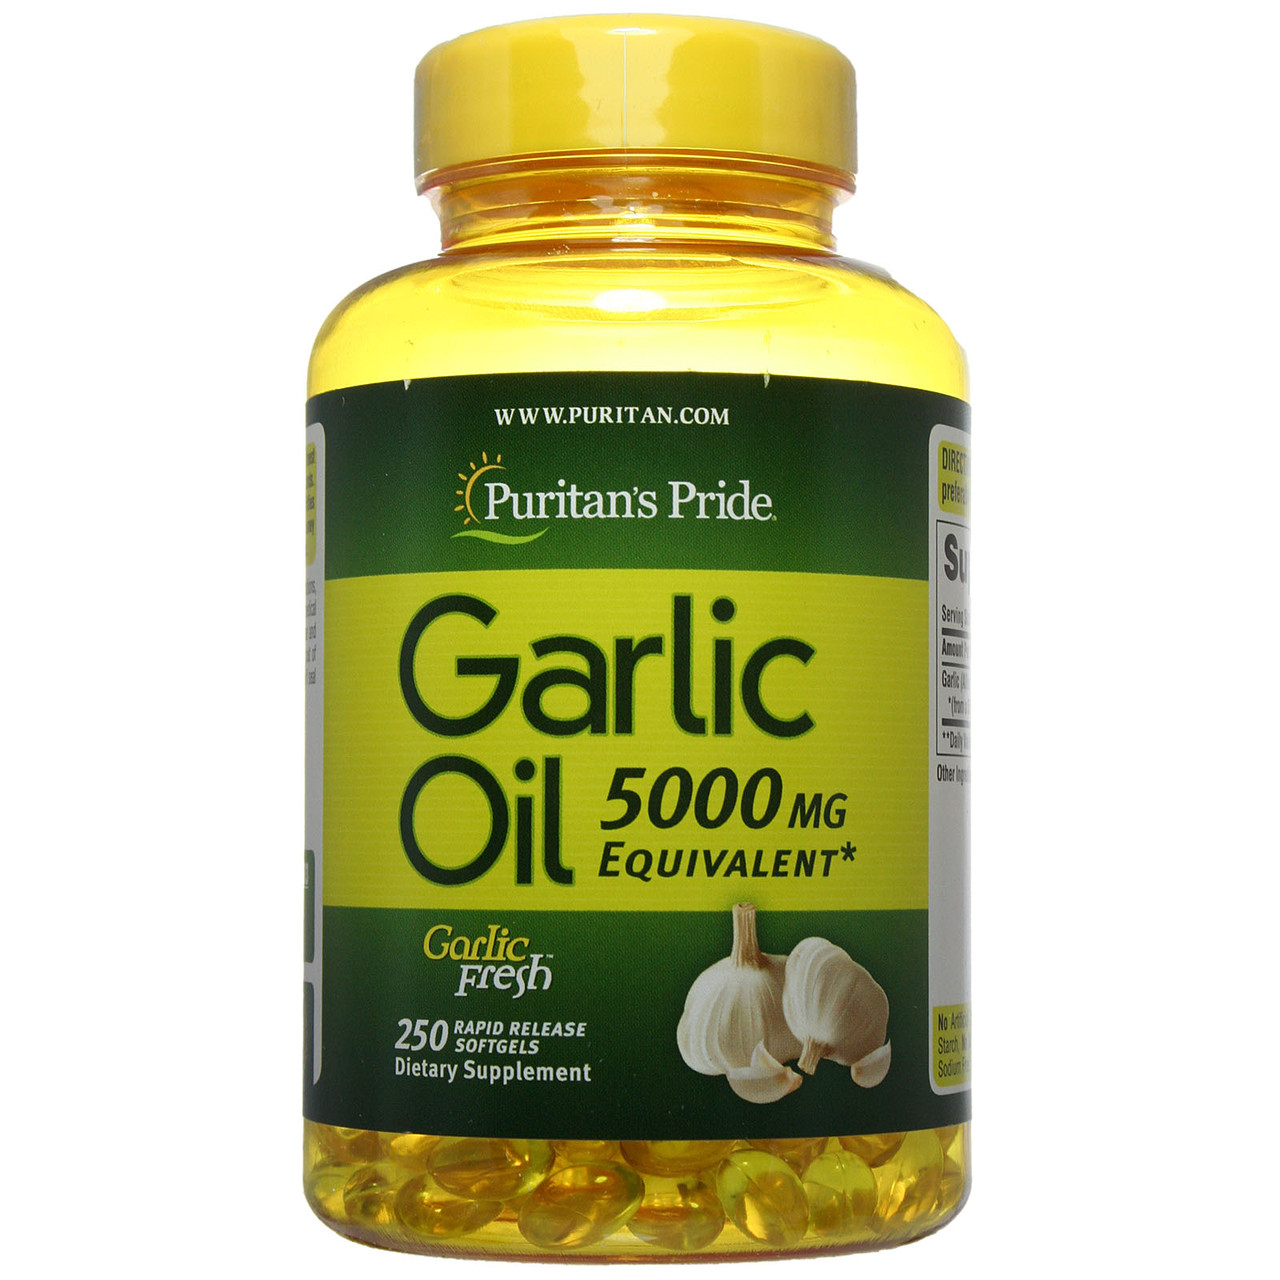 Чесночное масло, Garlic Oil 5000 mg, Puritan's Pride, 250 капсул